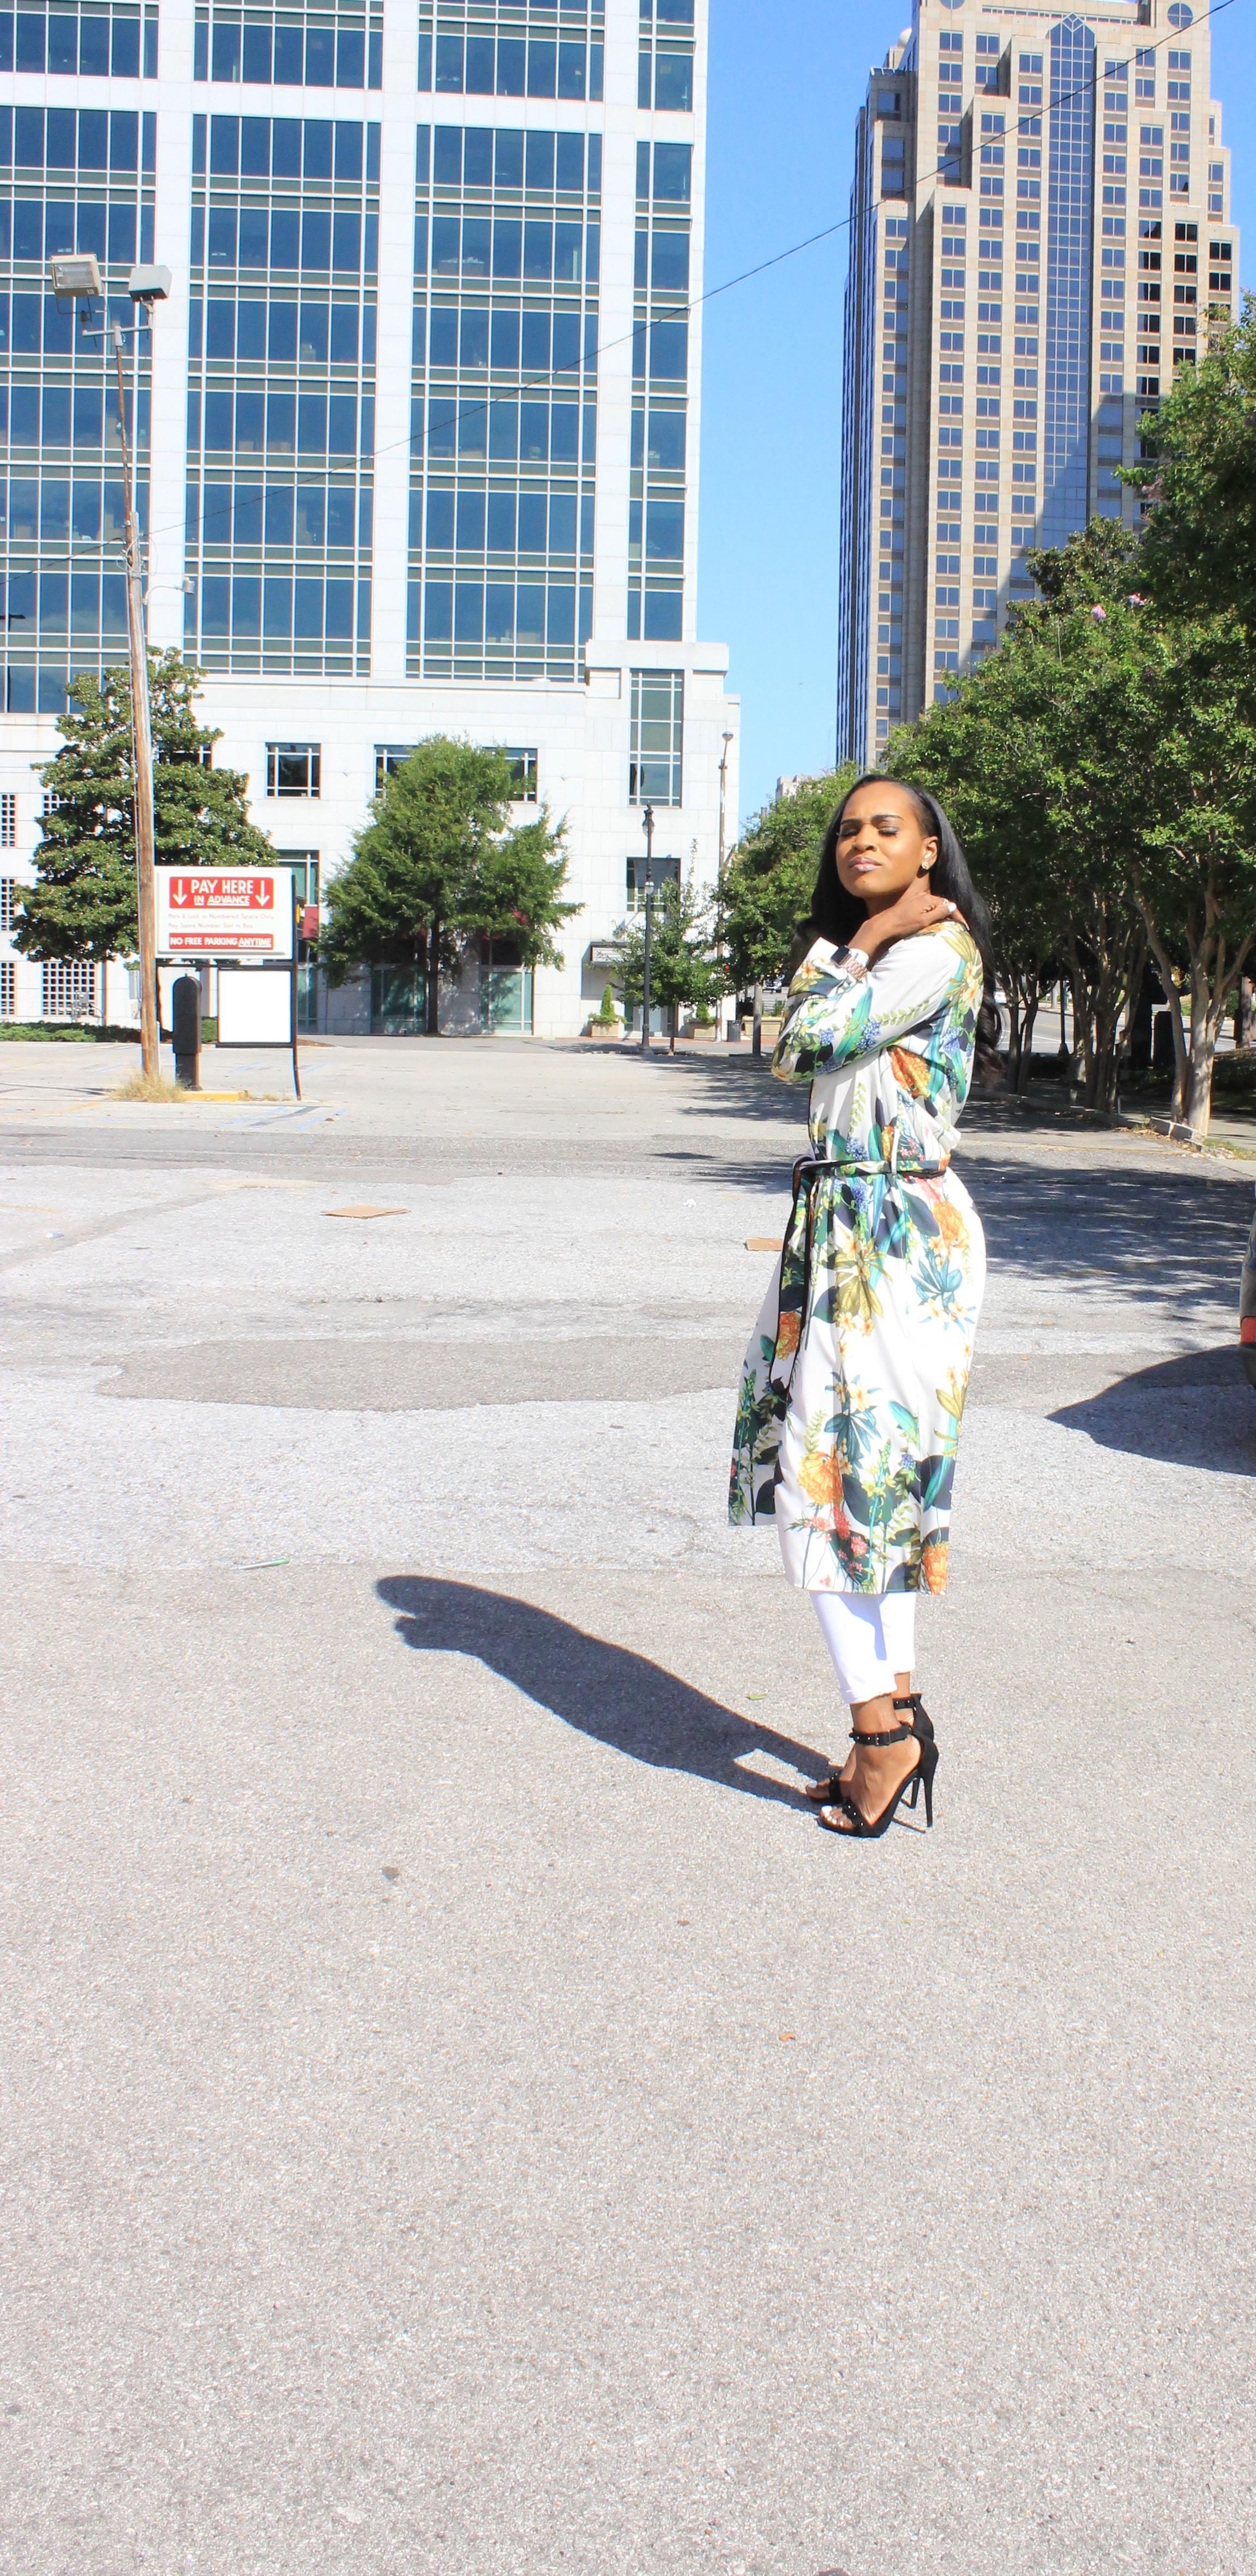 Style-files-White-Civil-Skinny-Jeans-forever-21-white-bodysuit-shein-white-floral-Open Front Longline Kimono -Cape-Ribbon-black-Meg Ankle Strap Beaded Heel-Cape-Ribbon-studded-ankle-strap-sandals-oohlalablog-